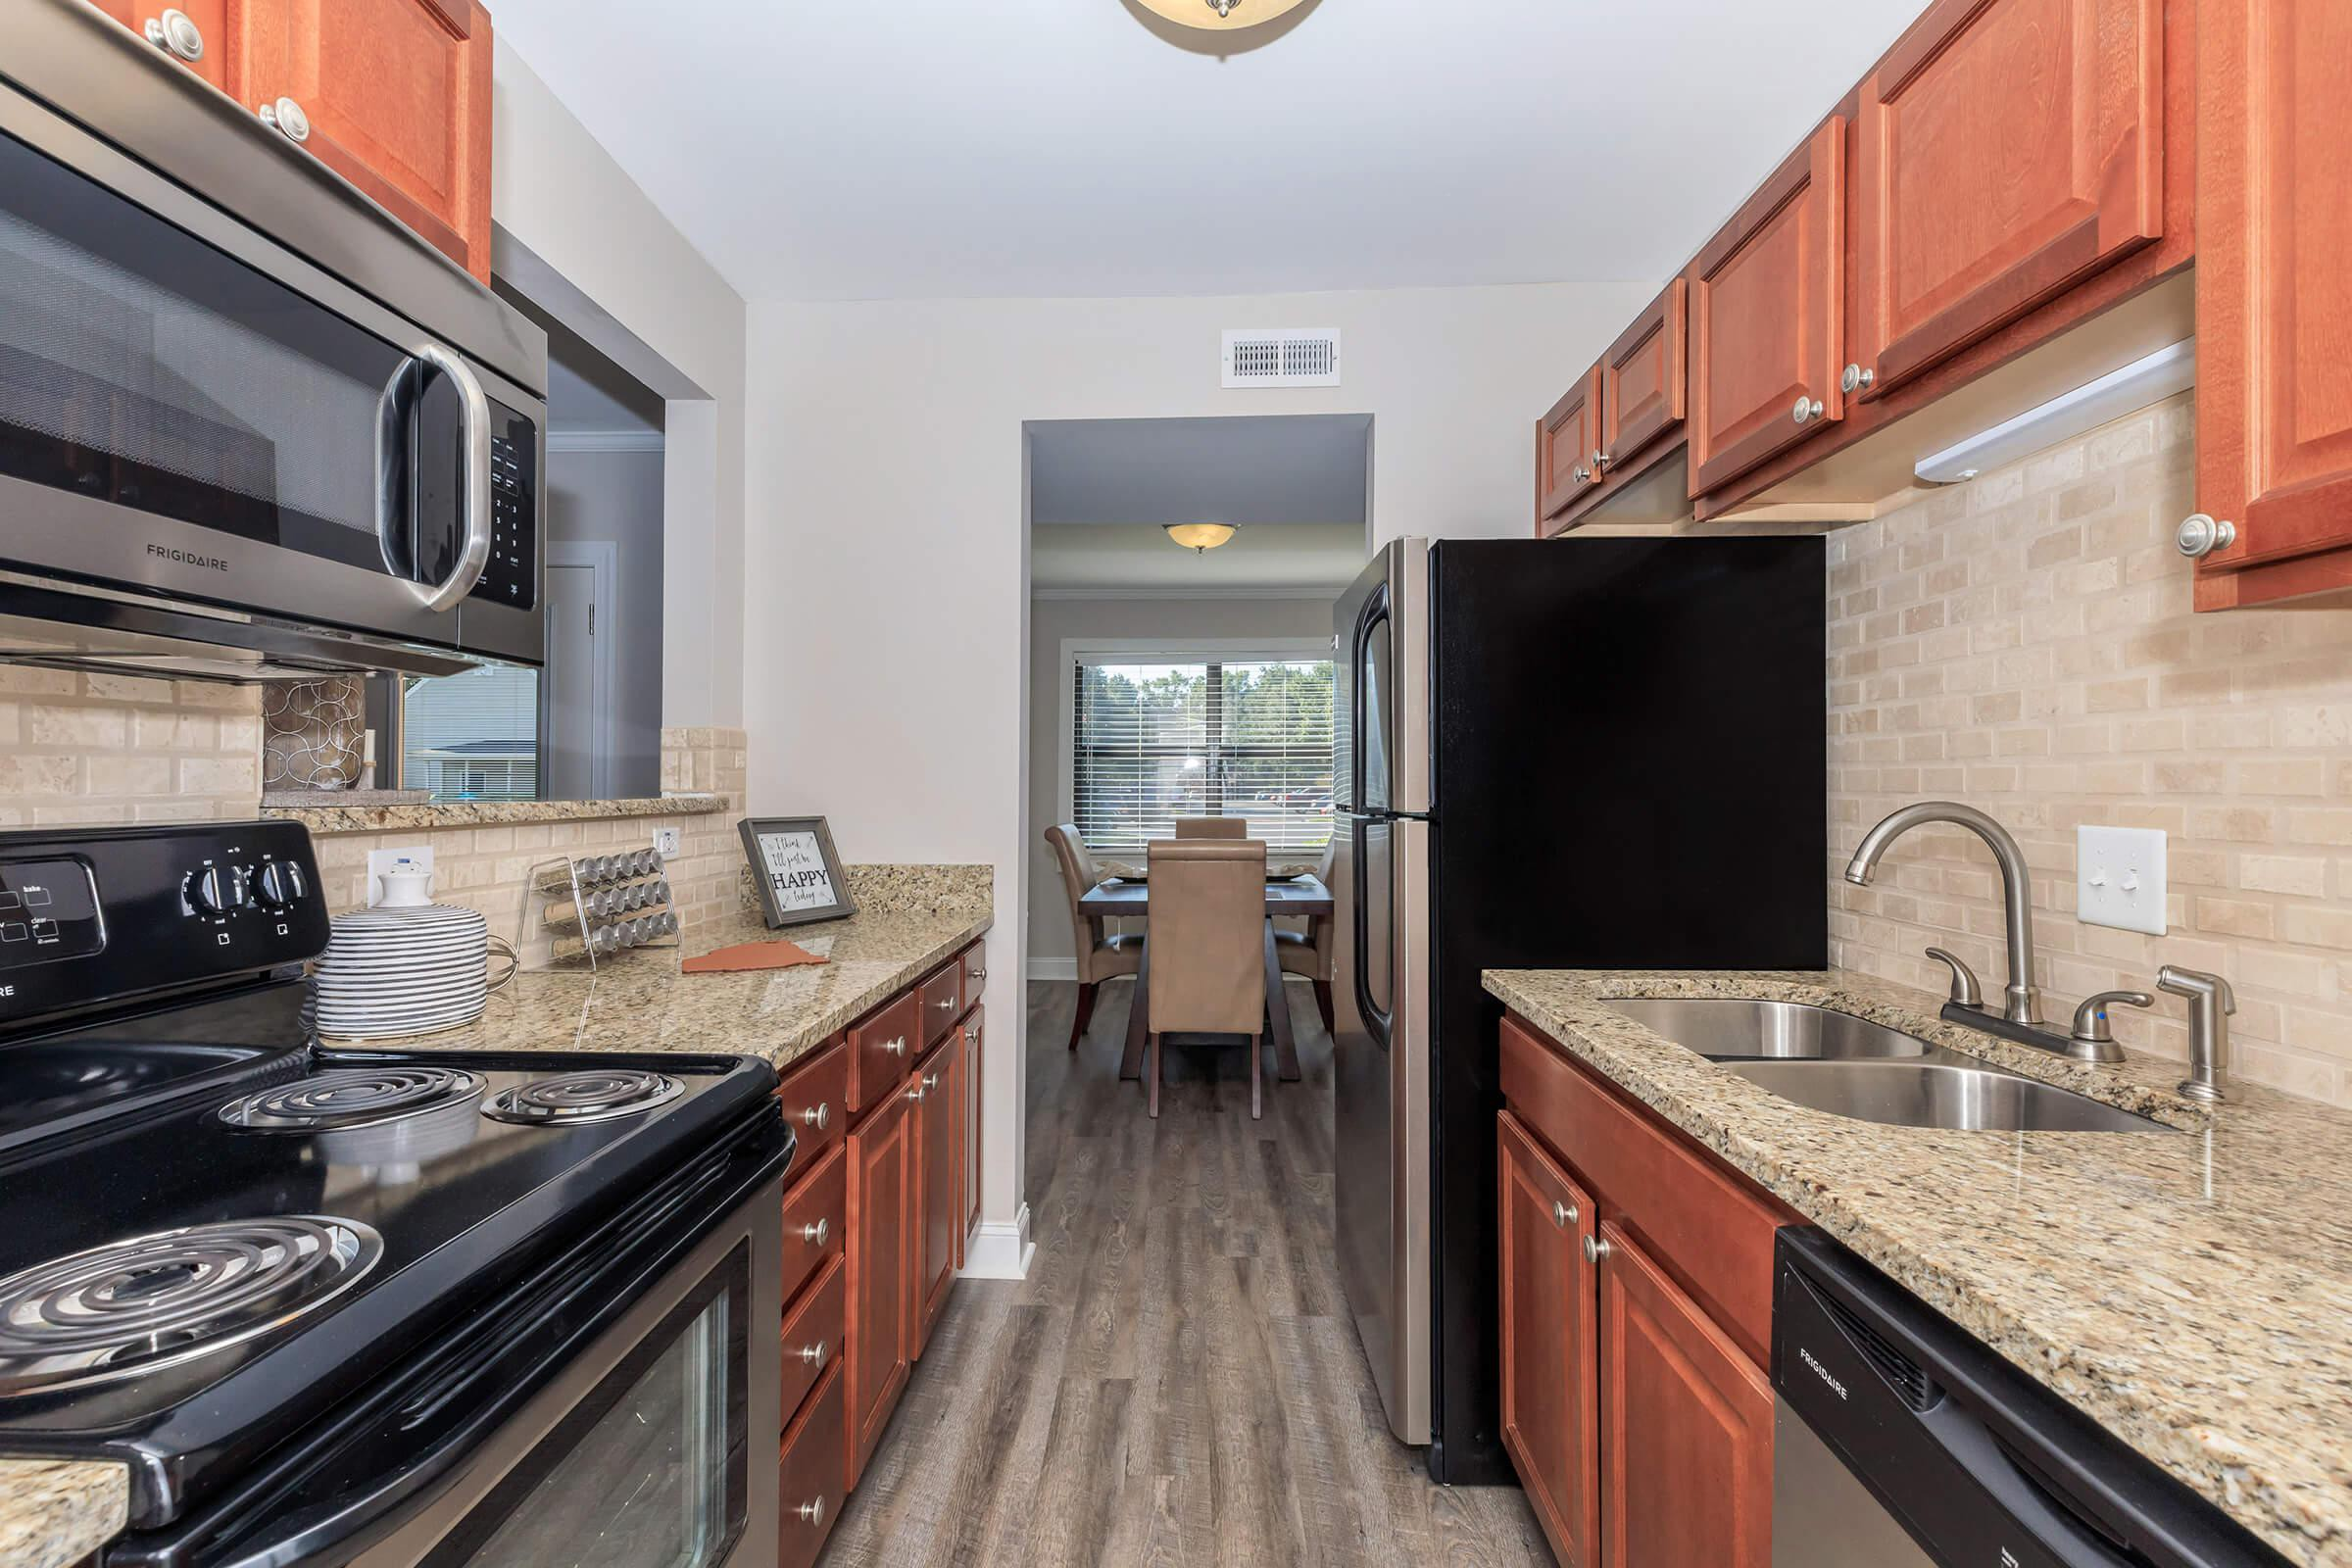 Apartments Near South Carolina Sawgrass Apartments for South Carolina Students in , SC